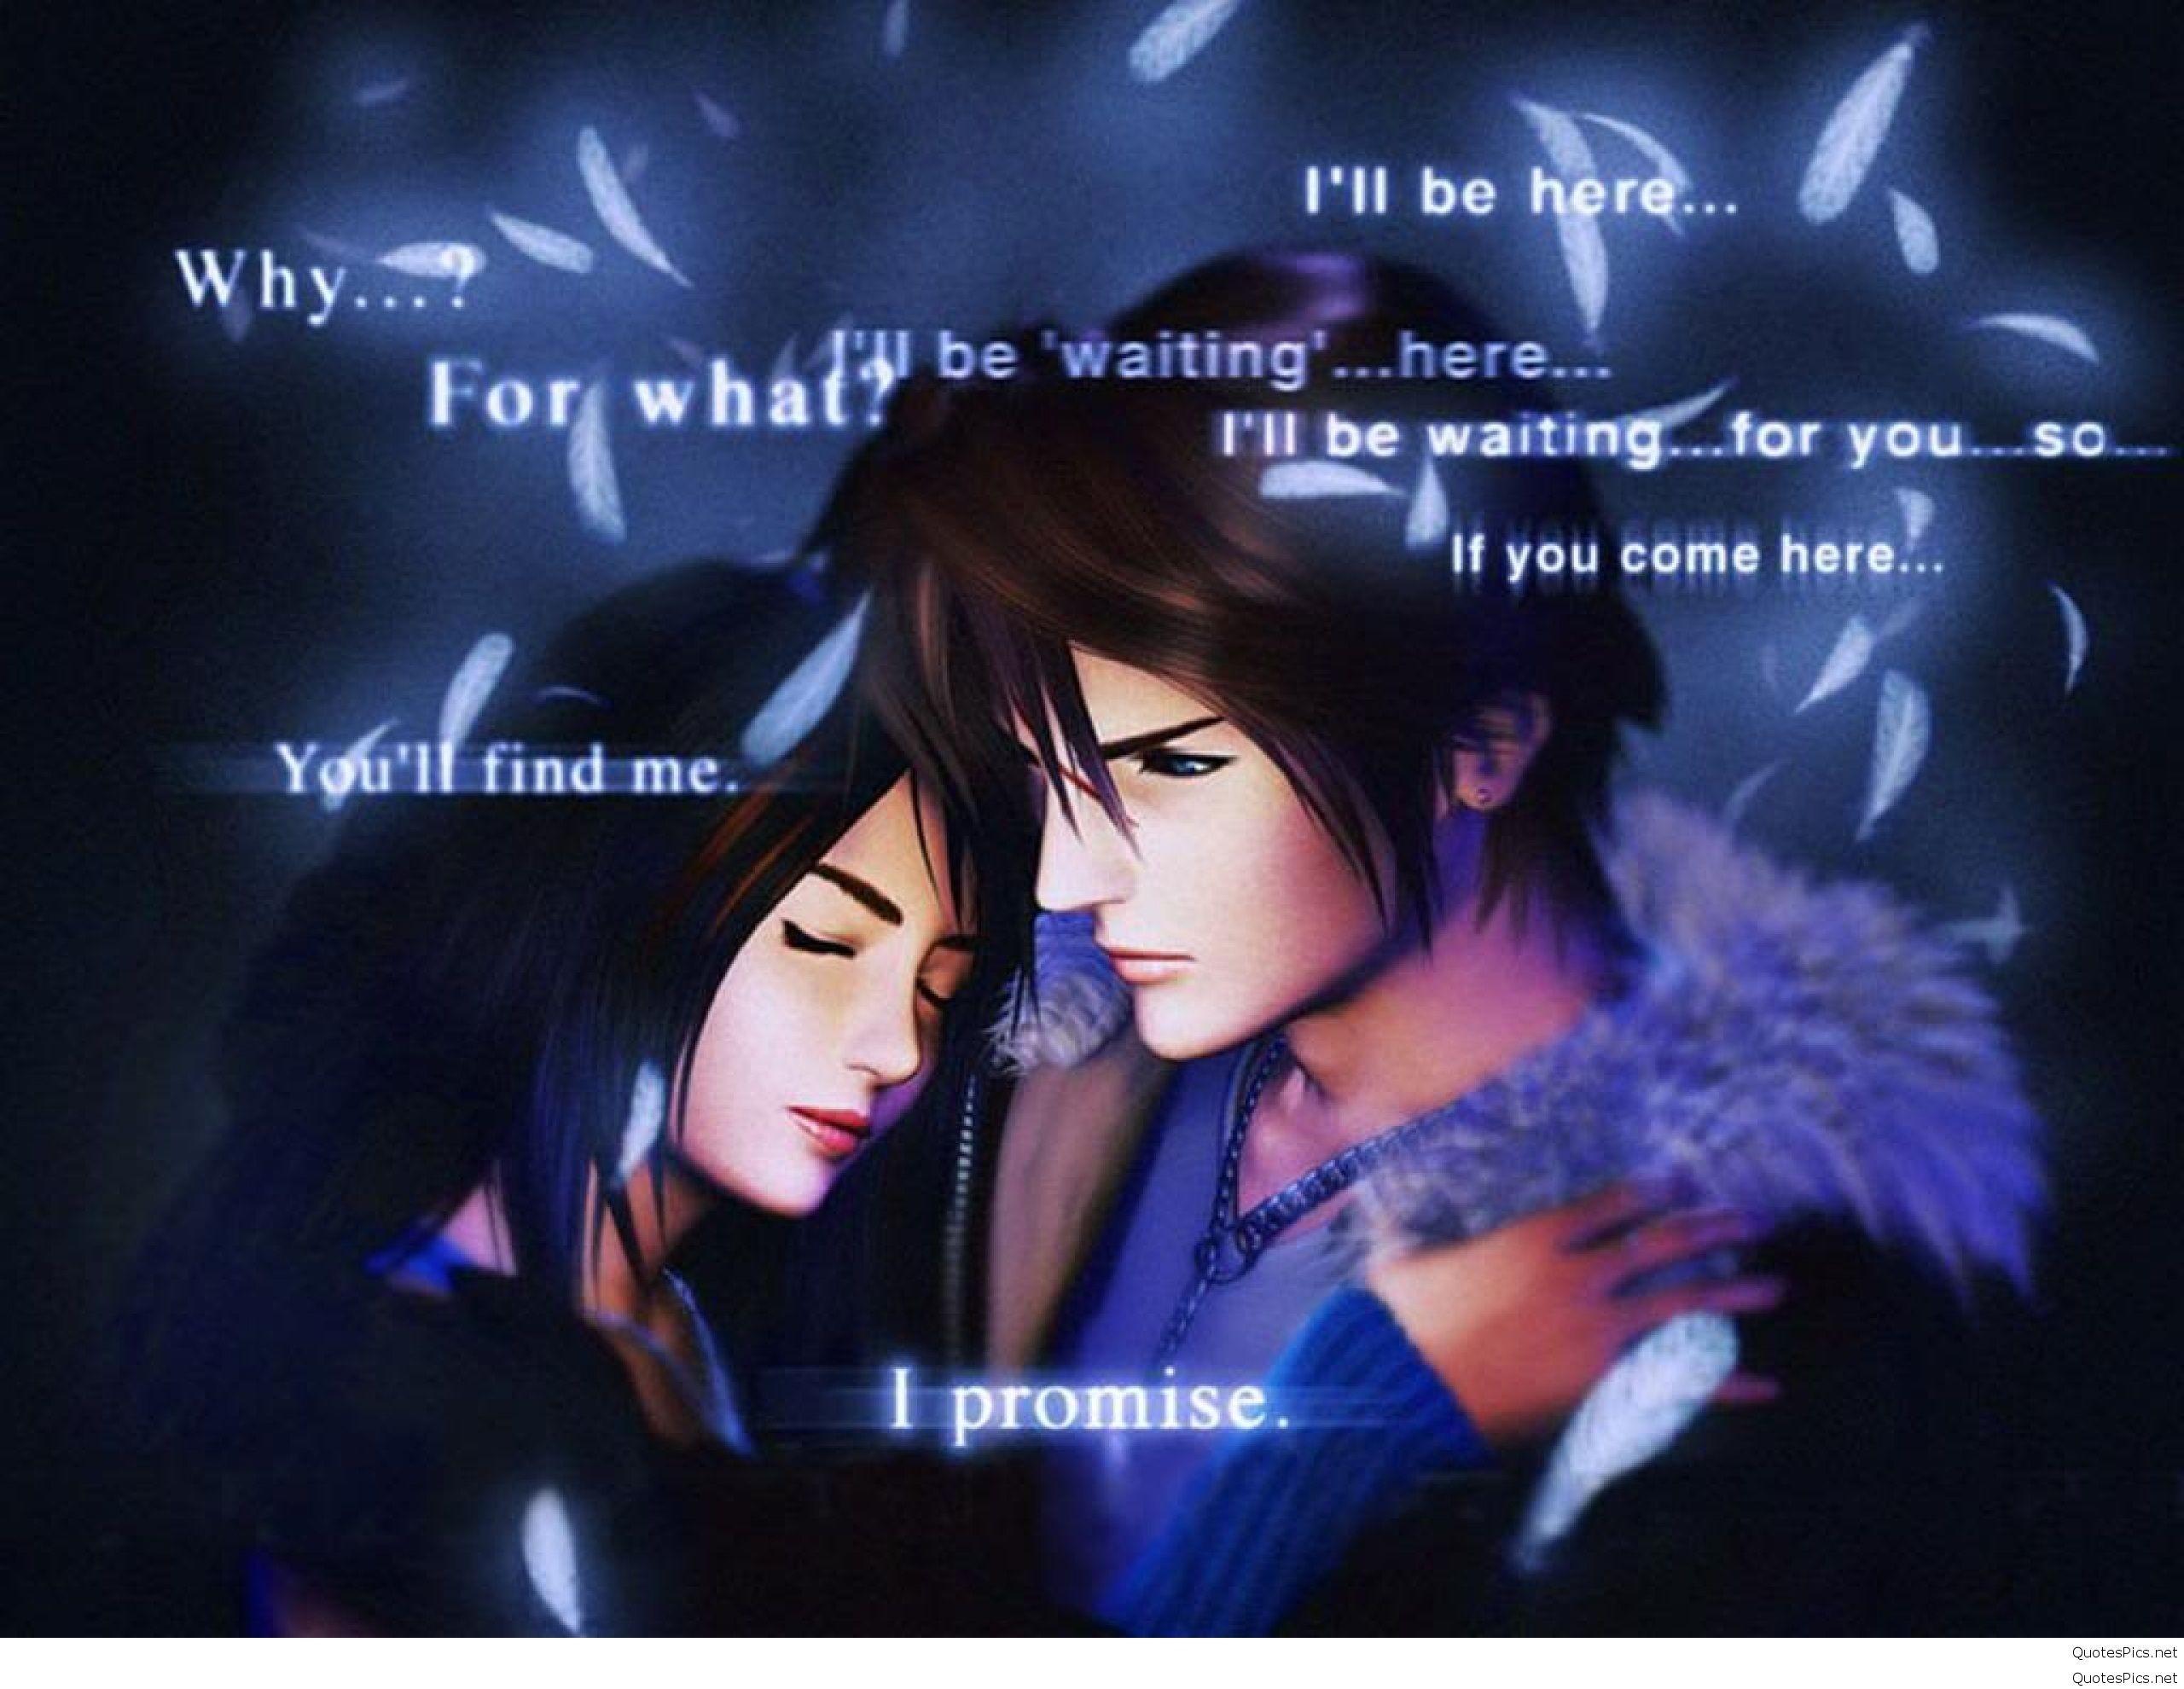 cute-anime-couples-wallpaper-desktop-1092-hd-wallpapers